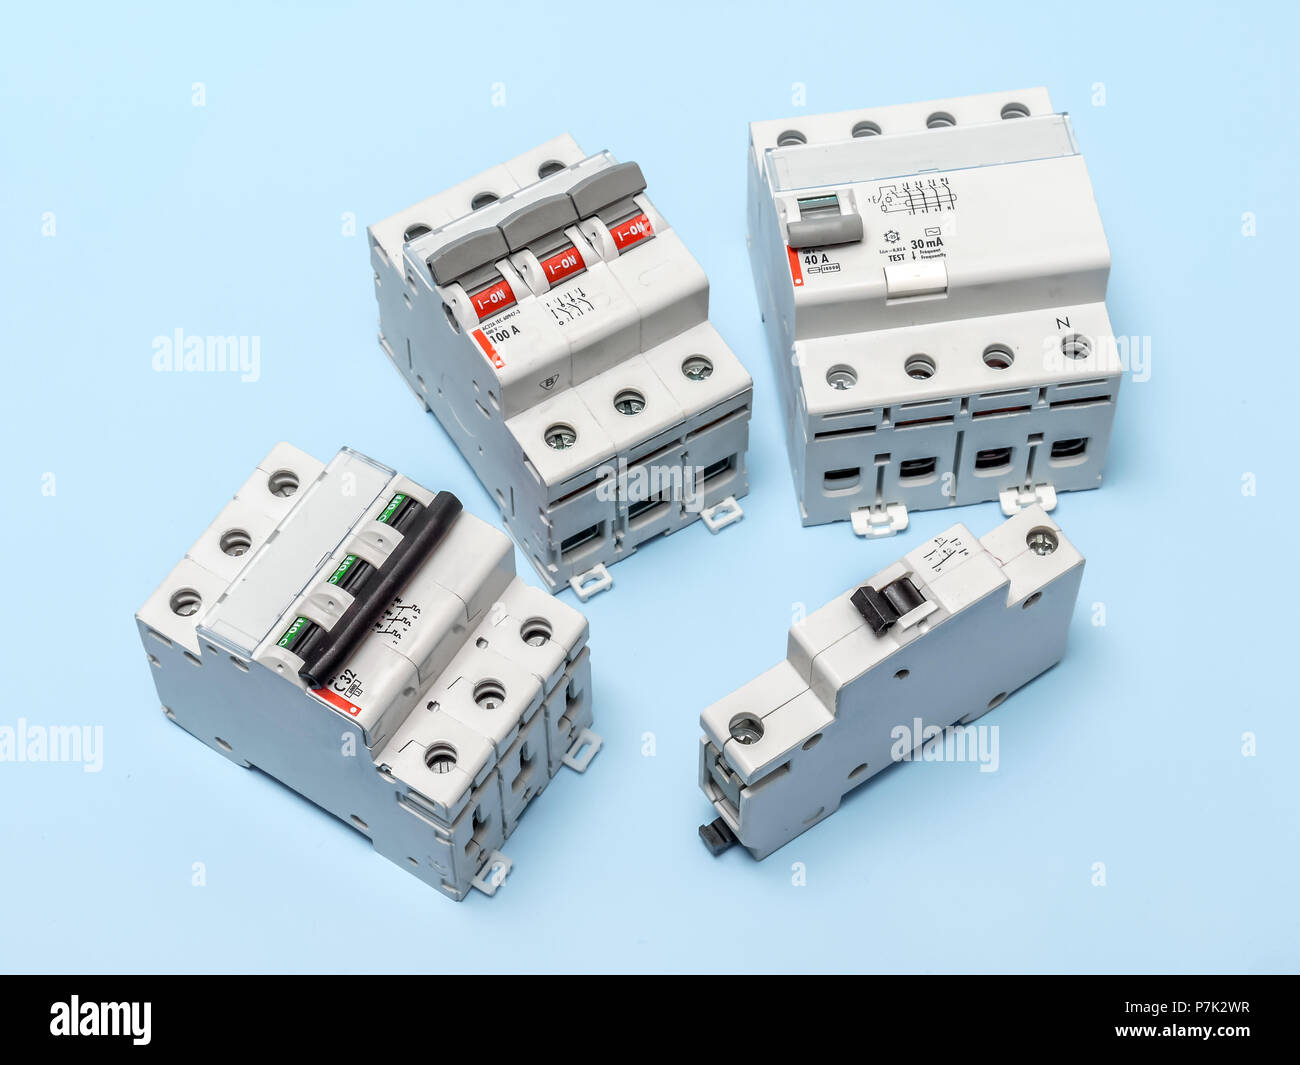 Main Breaker Electrical Stock Photos & Main Breaker Electrical Stock ...